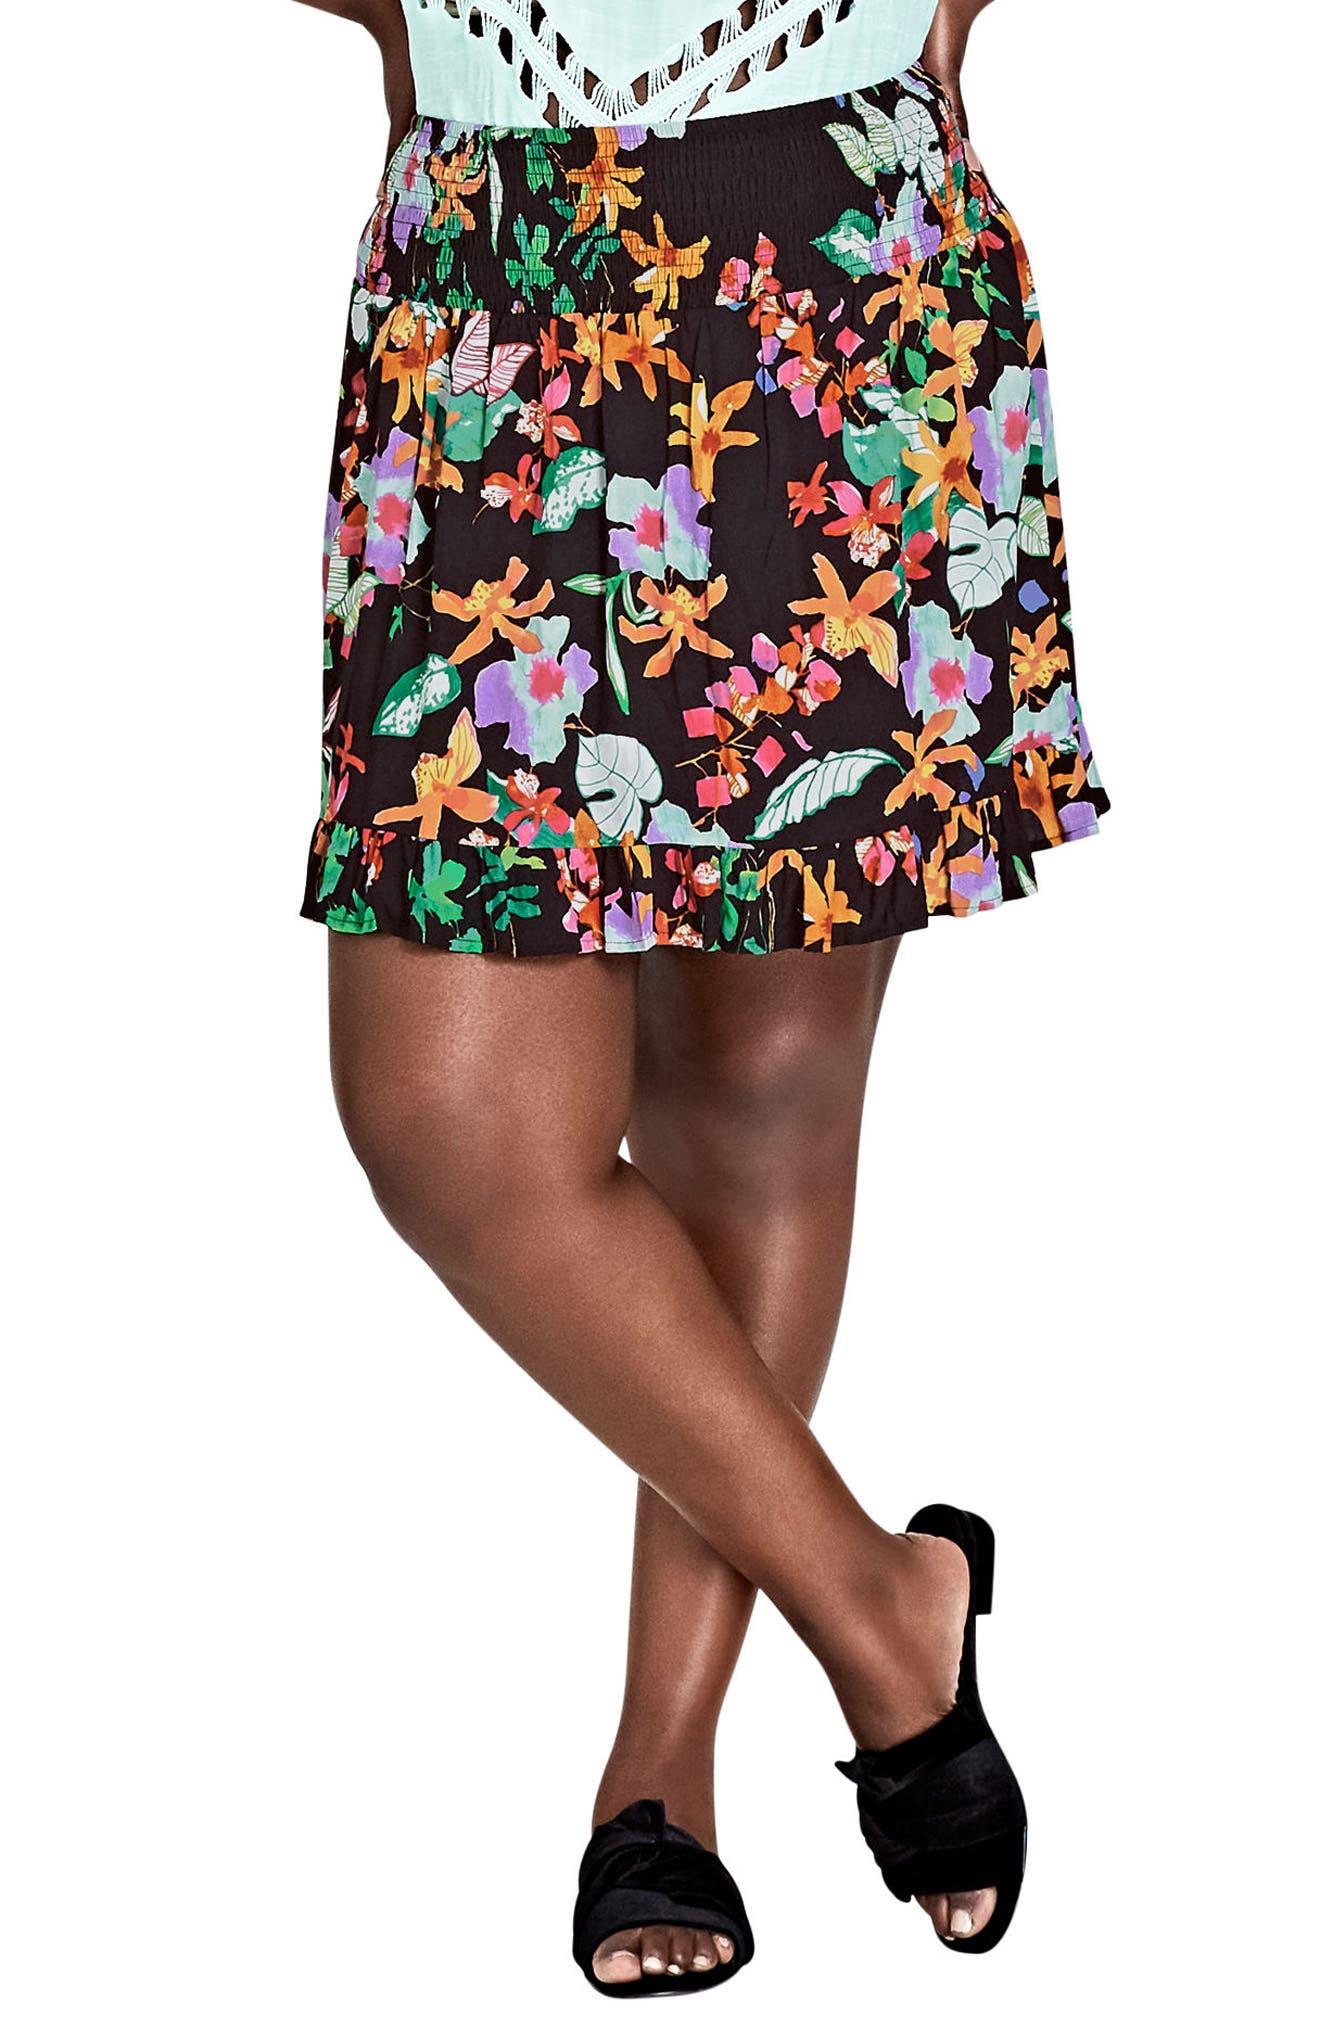 CITY CHIC Molokai Floral Skirt, Main, color, 009